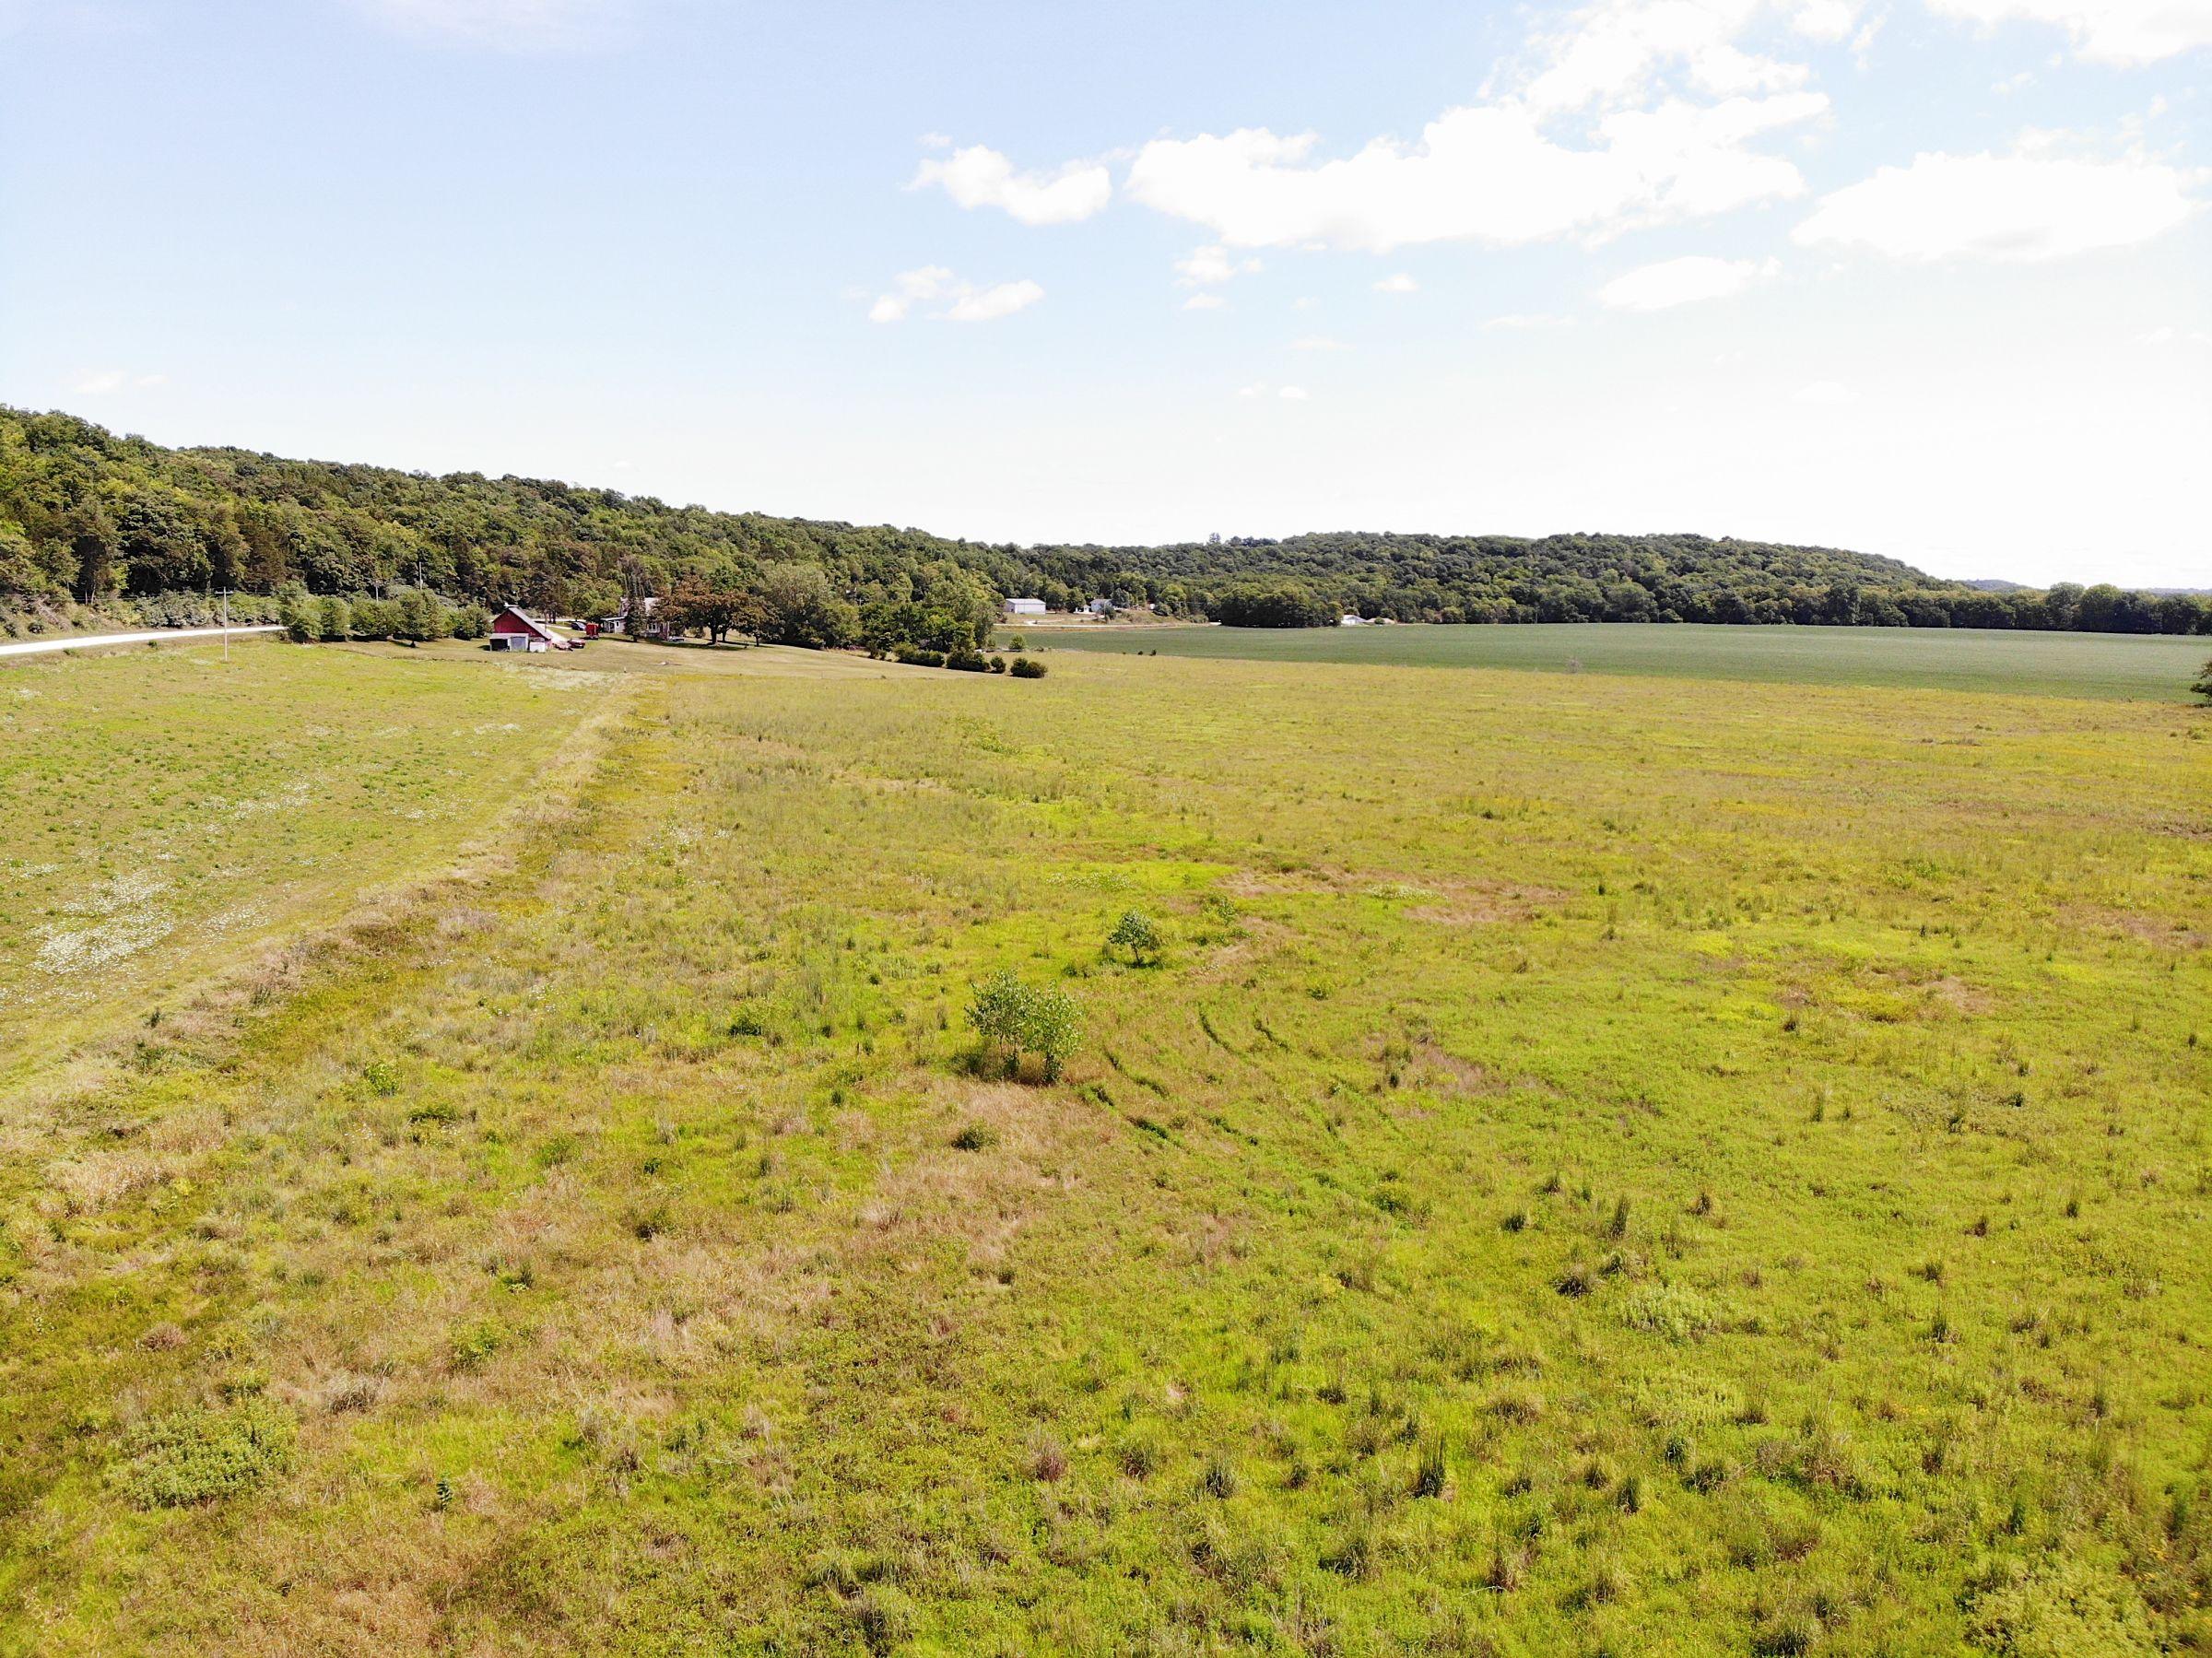 land-warren-county-iowa-84-acres-listing-number-15103-6-2020-08-05-144424.jpg